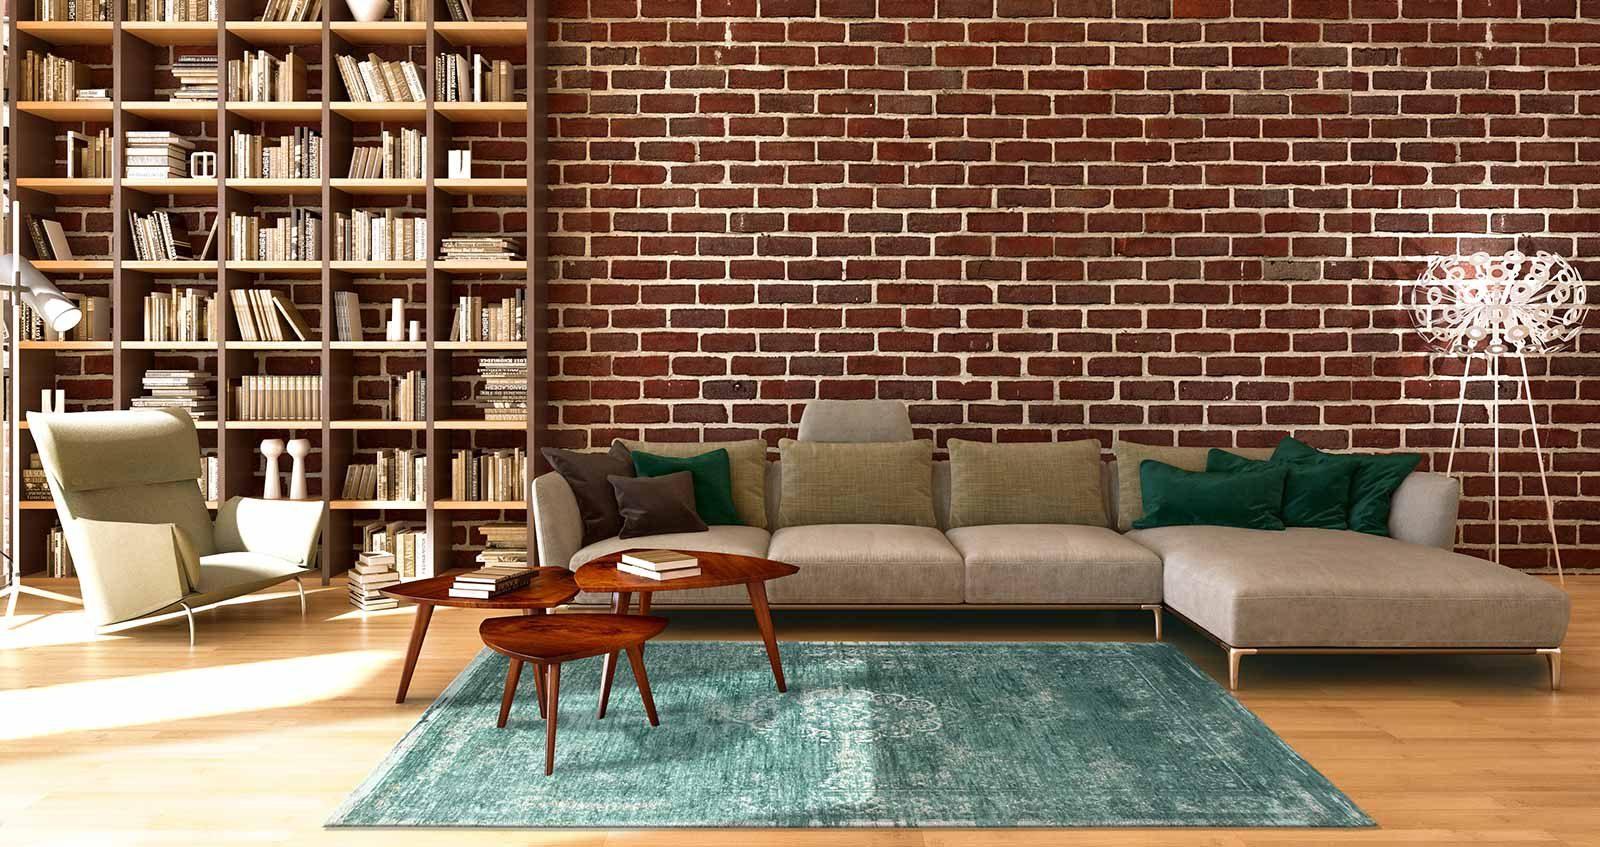 alfombras Louis De Poortere LX8258 Fading World Medaillon Jade interior